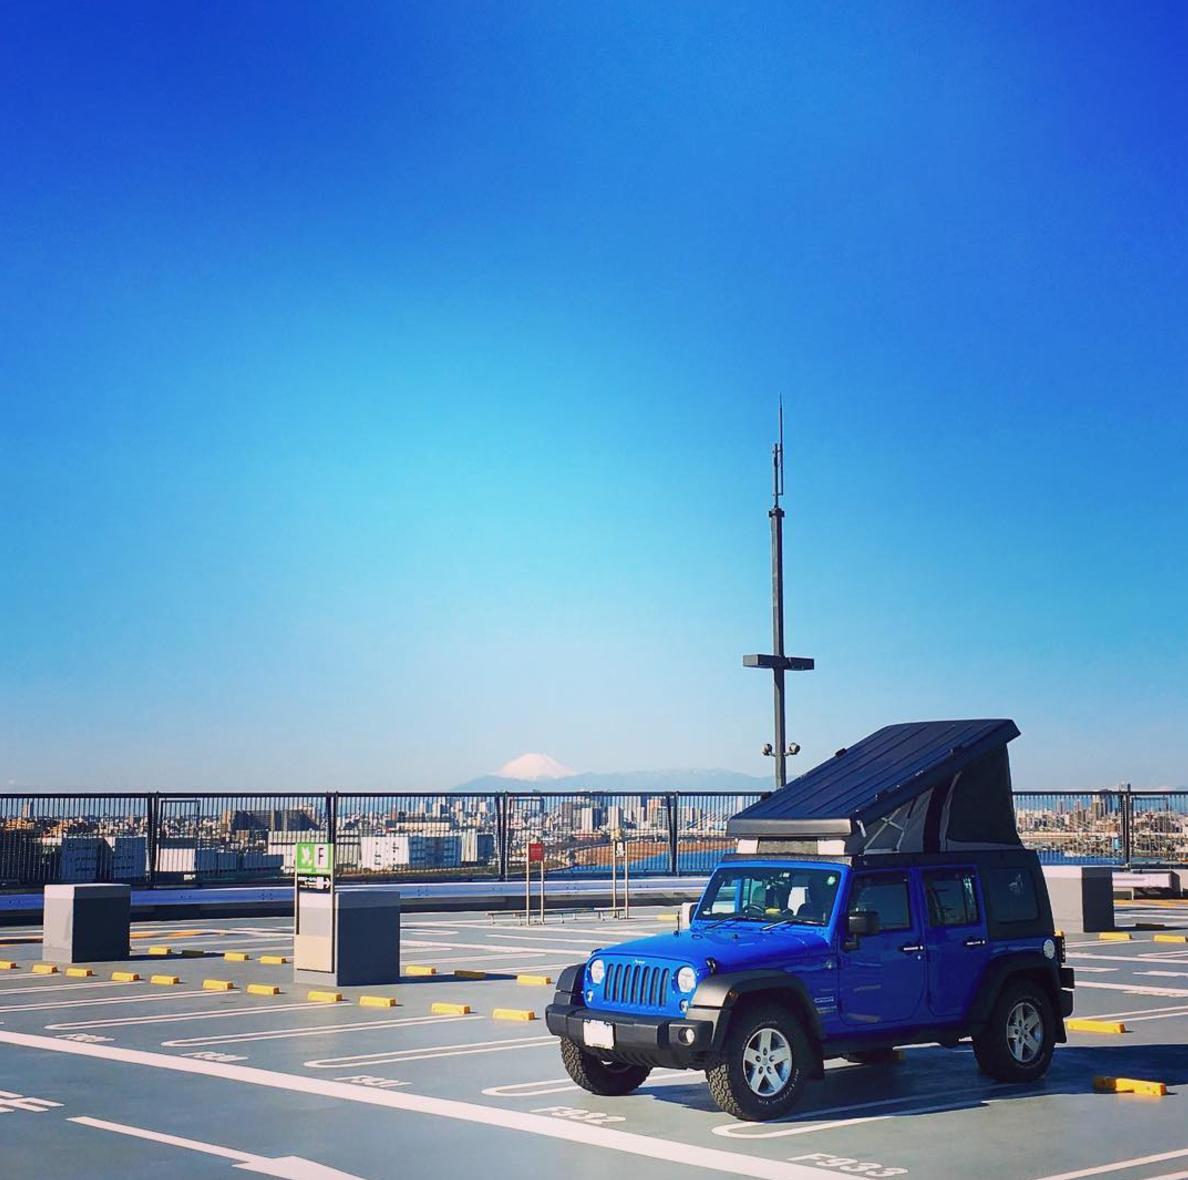 jeepcamper081